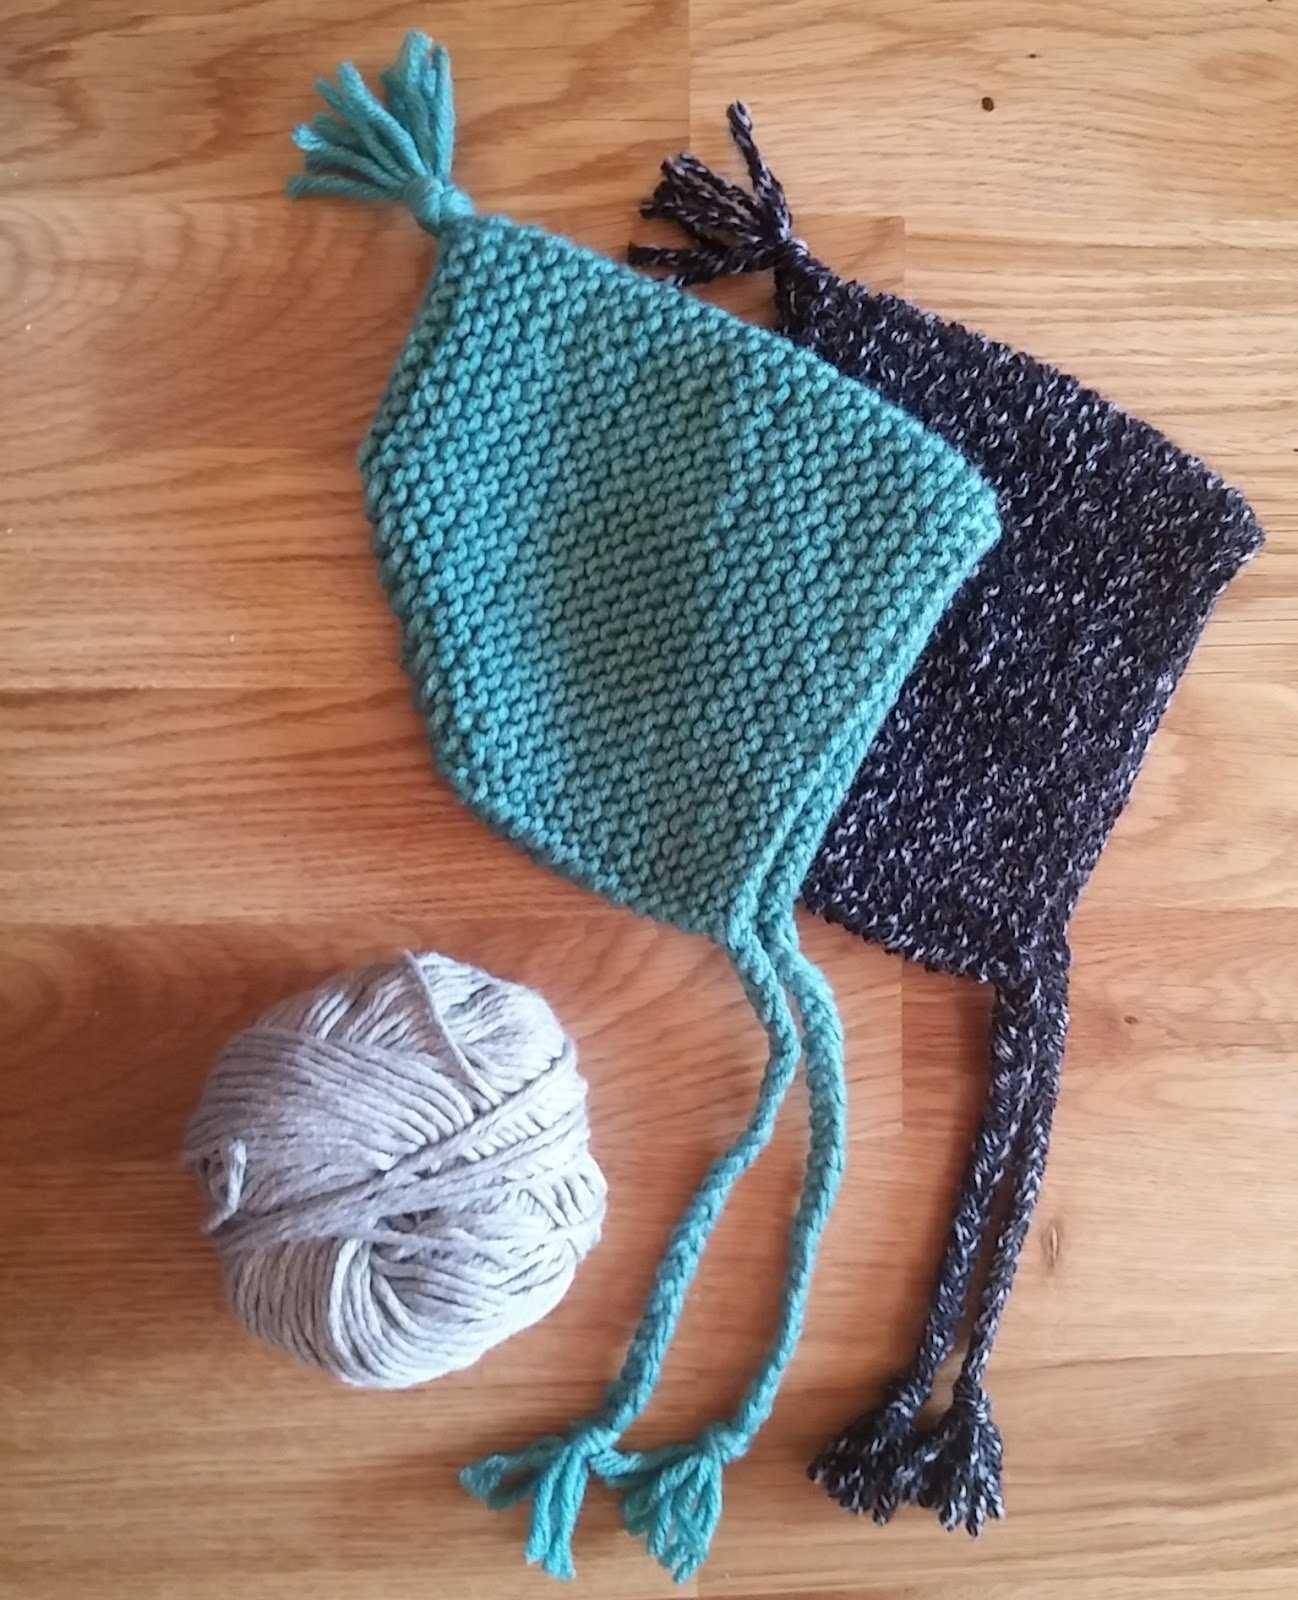 fc406a03713c Bonnet de bébé lutin   NeedleWorks   Knitting, Baby knitting, Tricot ...